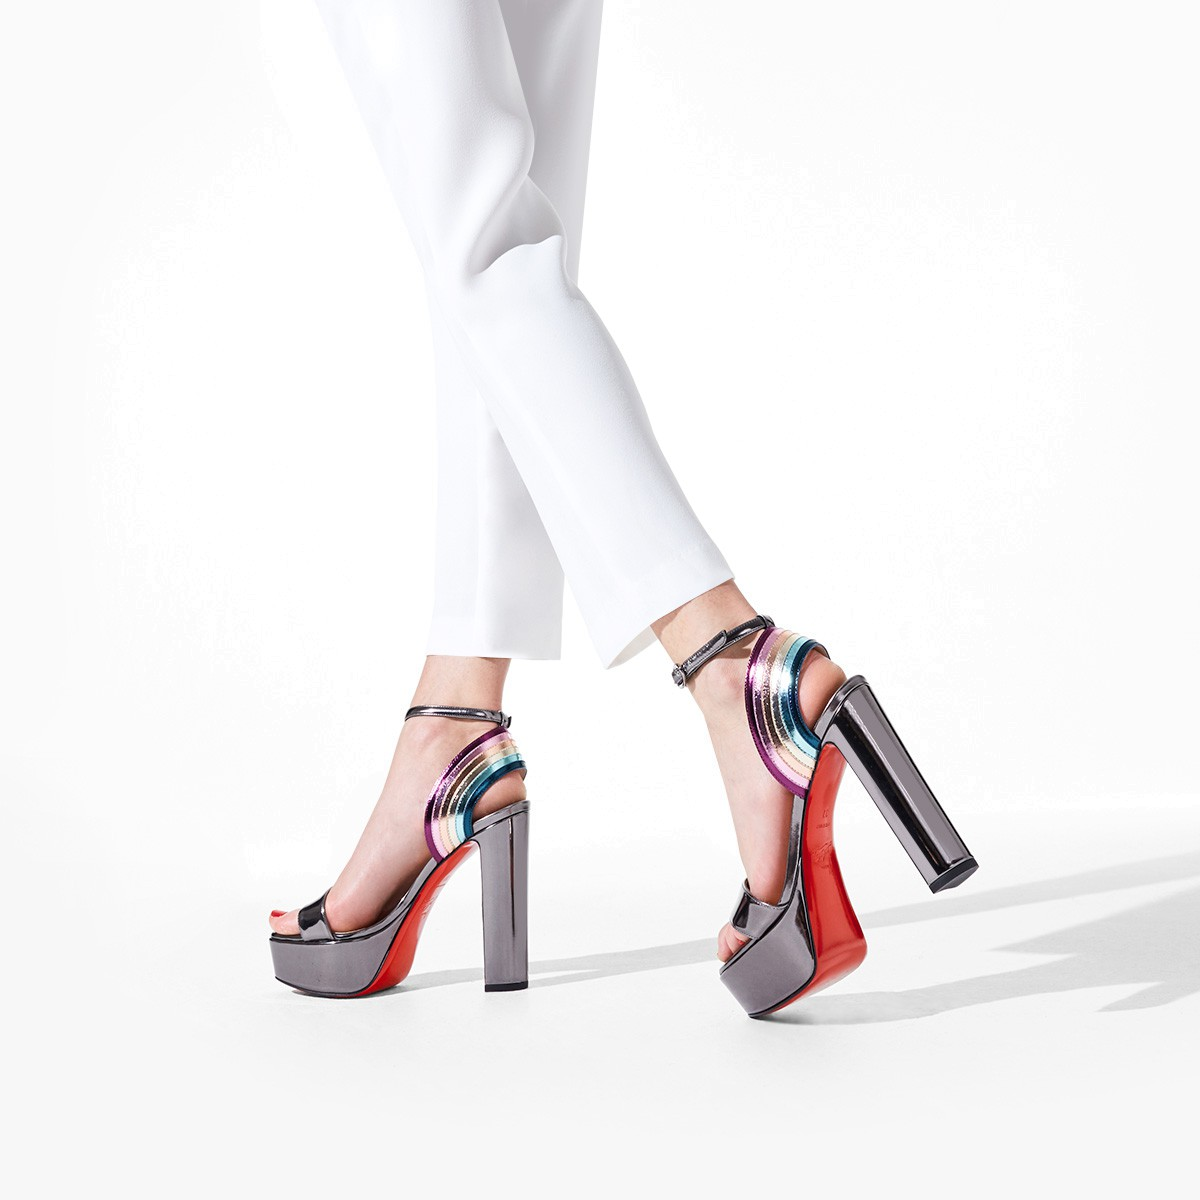 Shoes - Arkendisc - Christian Louboutin